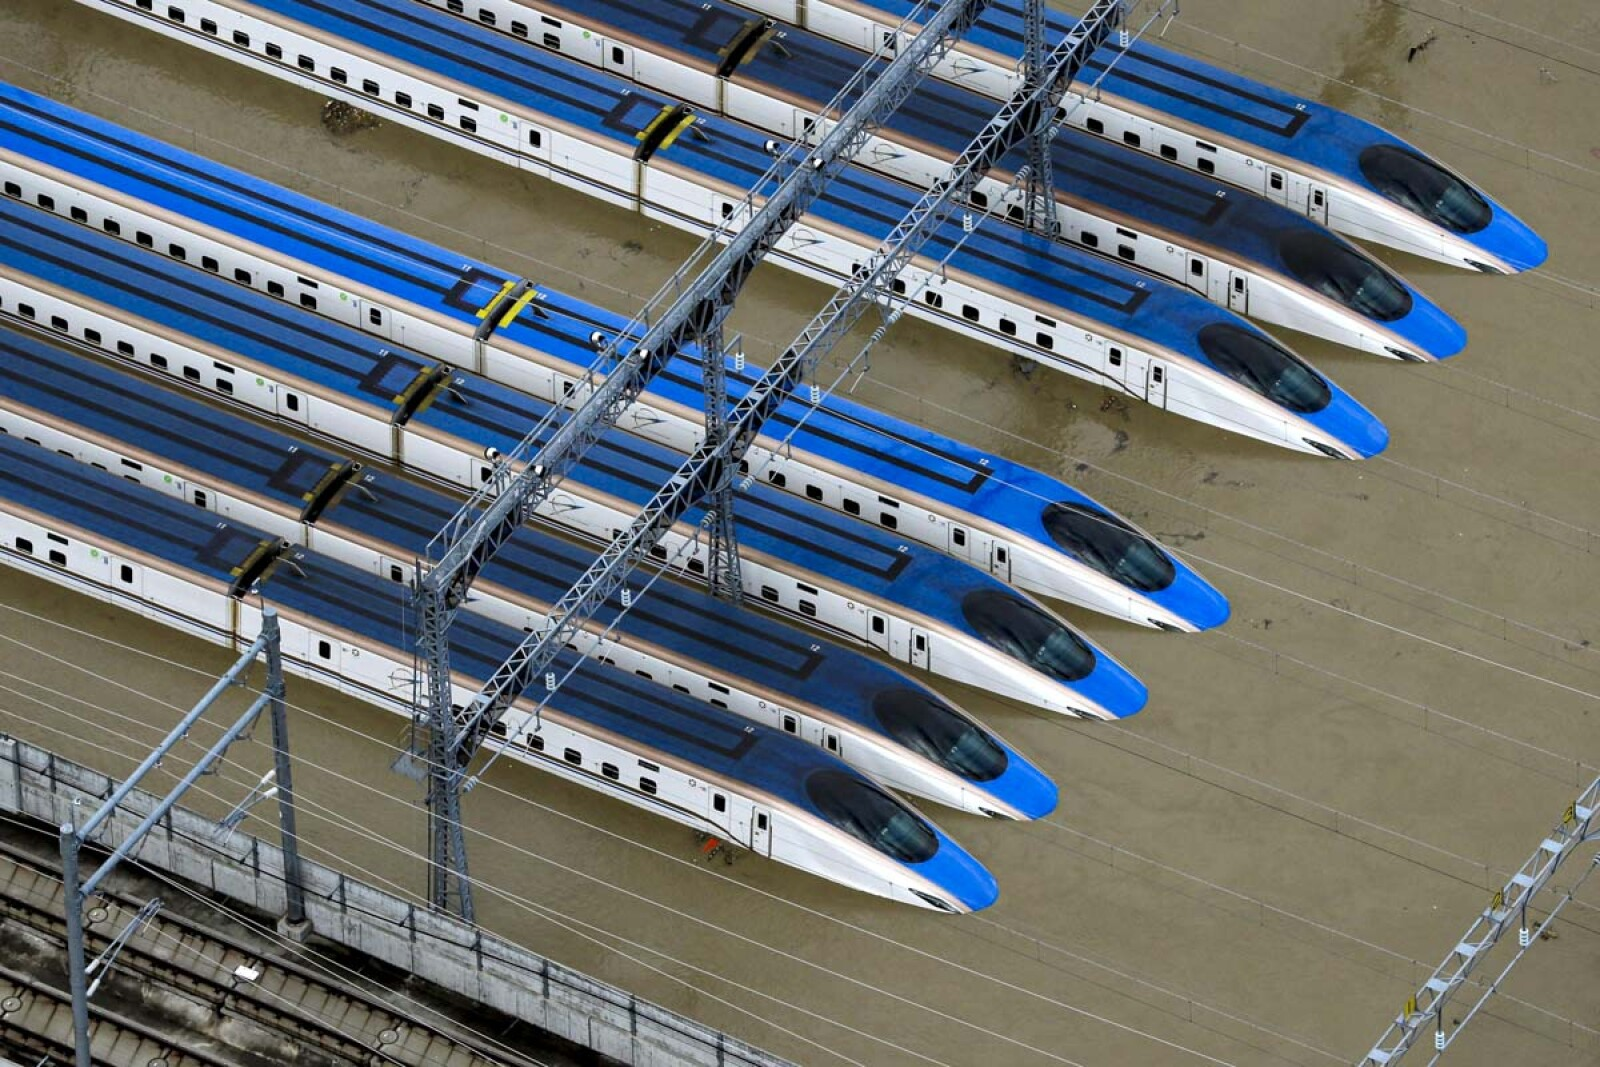 A flooded Shinkansen bullet train rail yard is seen following Typhoon Hagibis in Nagano